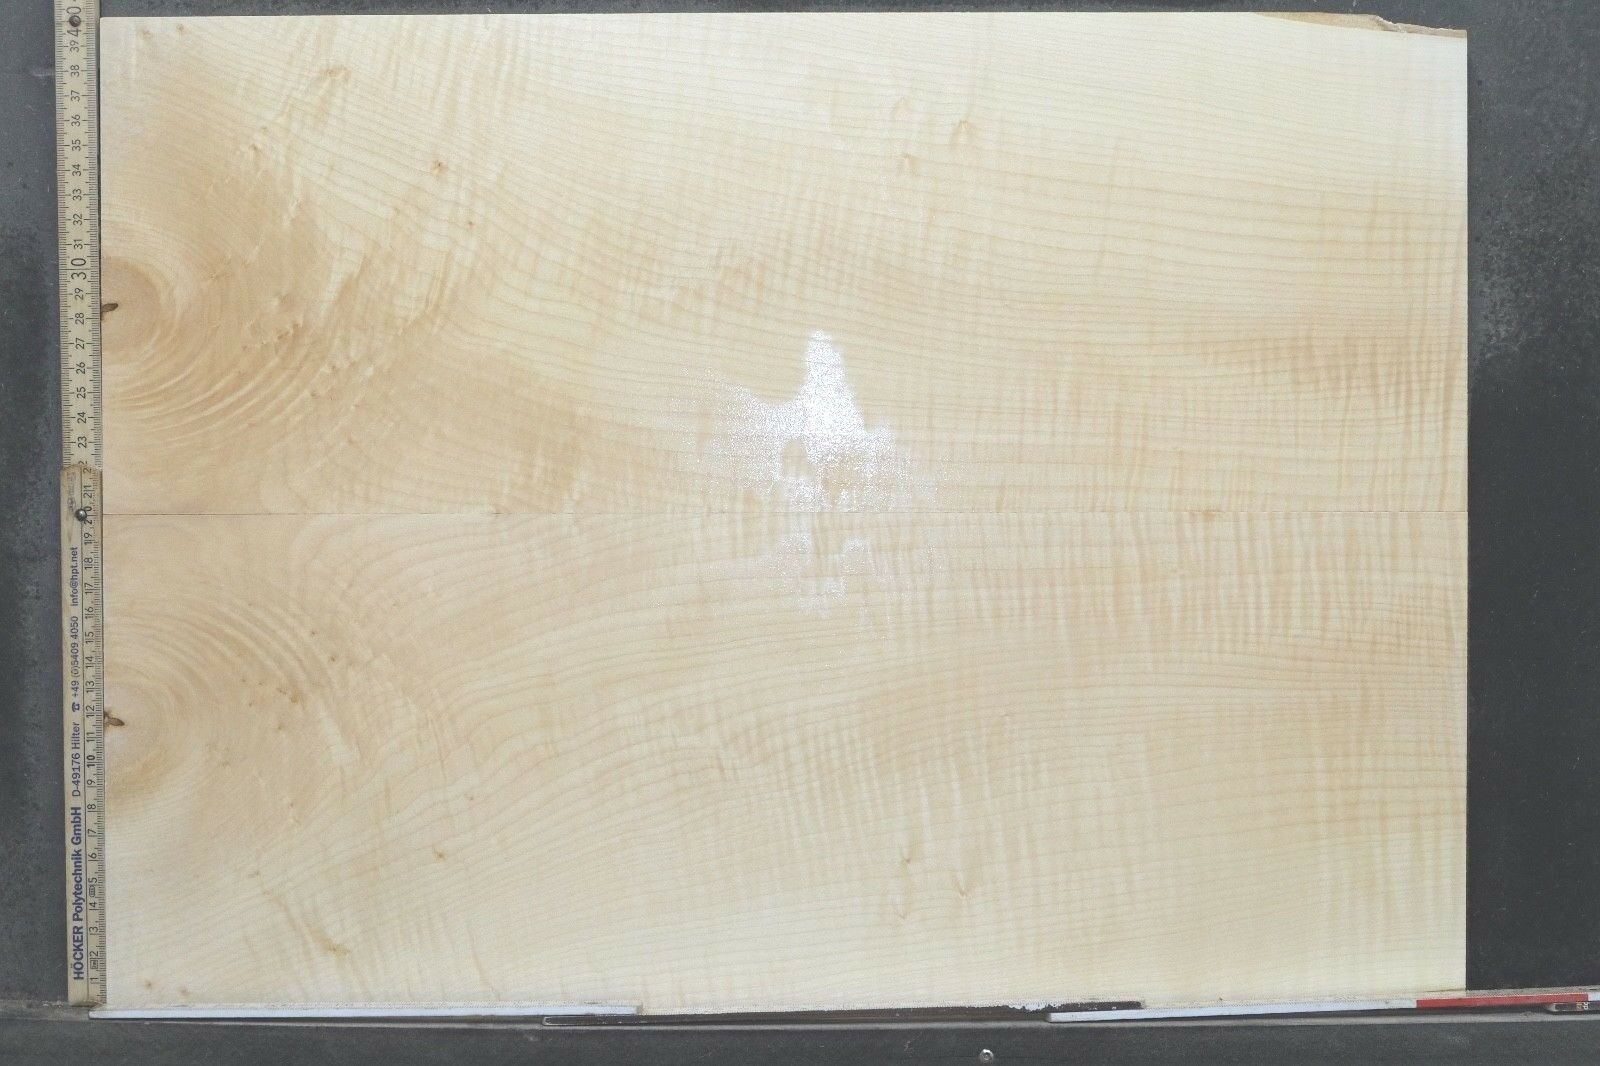 Tonewood Riegel Ahorn Flamed Maple 11,8 mm Aufleimer Guitar Tonholz Droptop 266